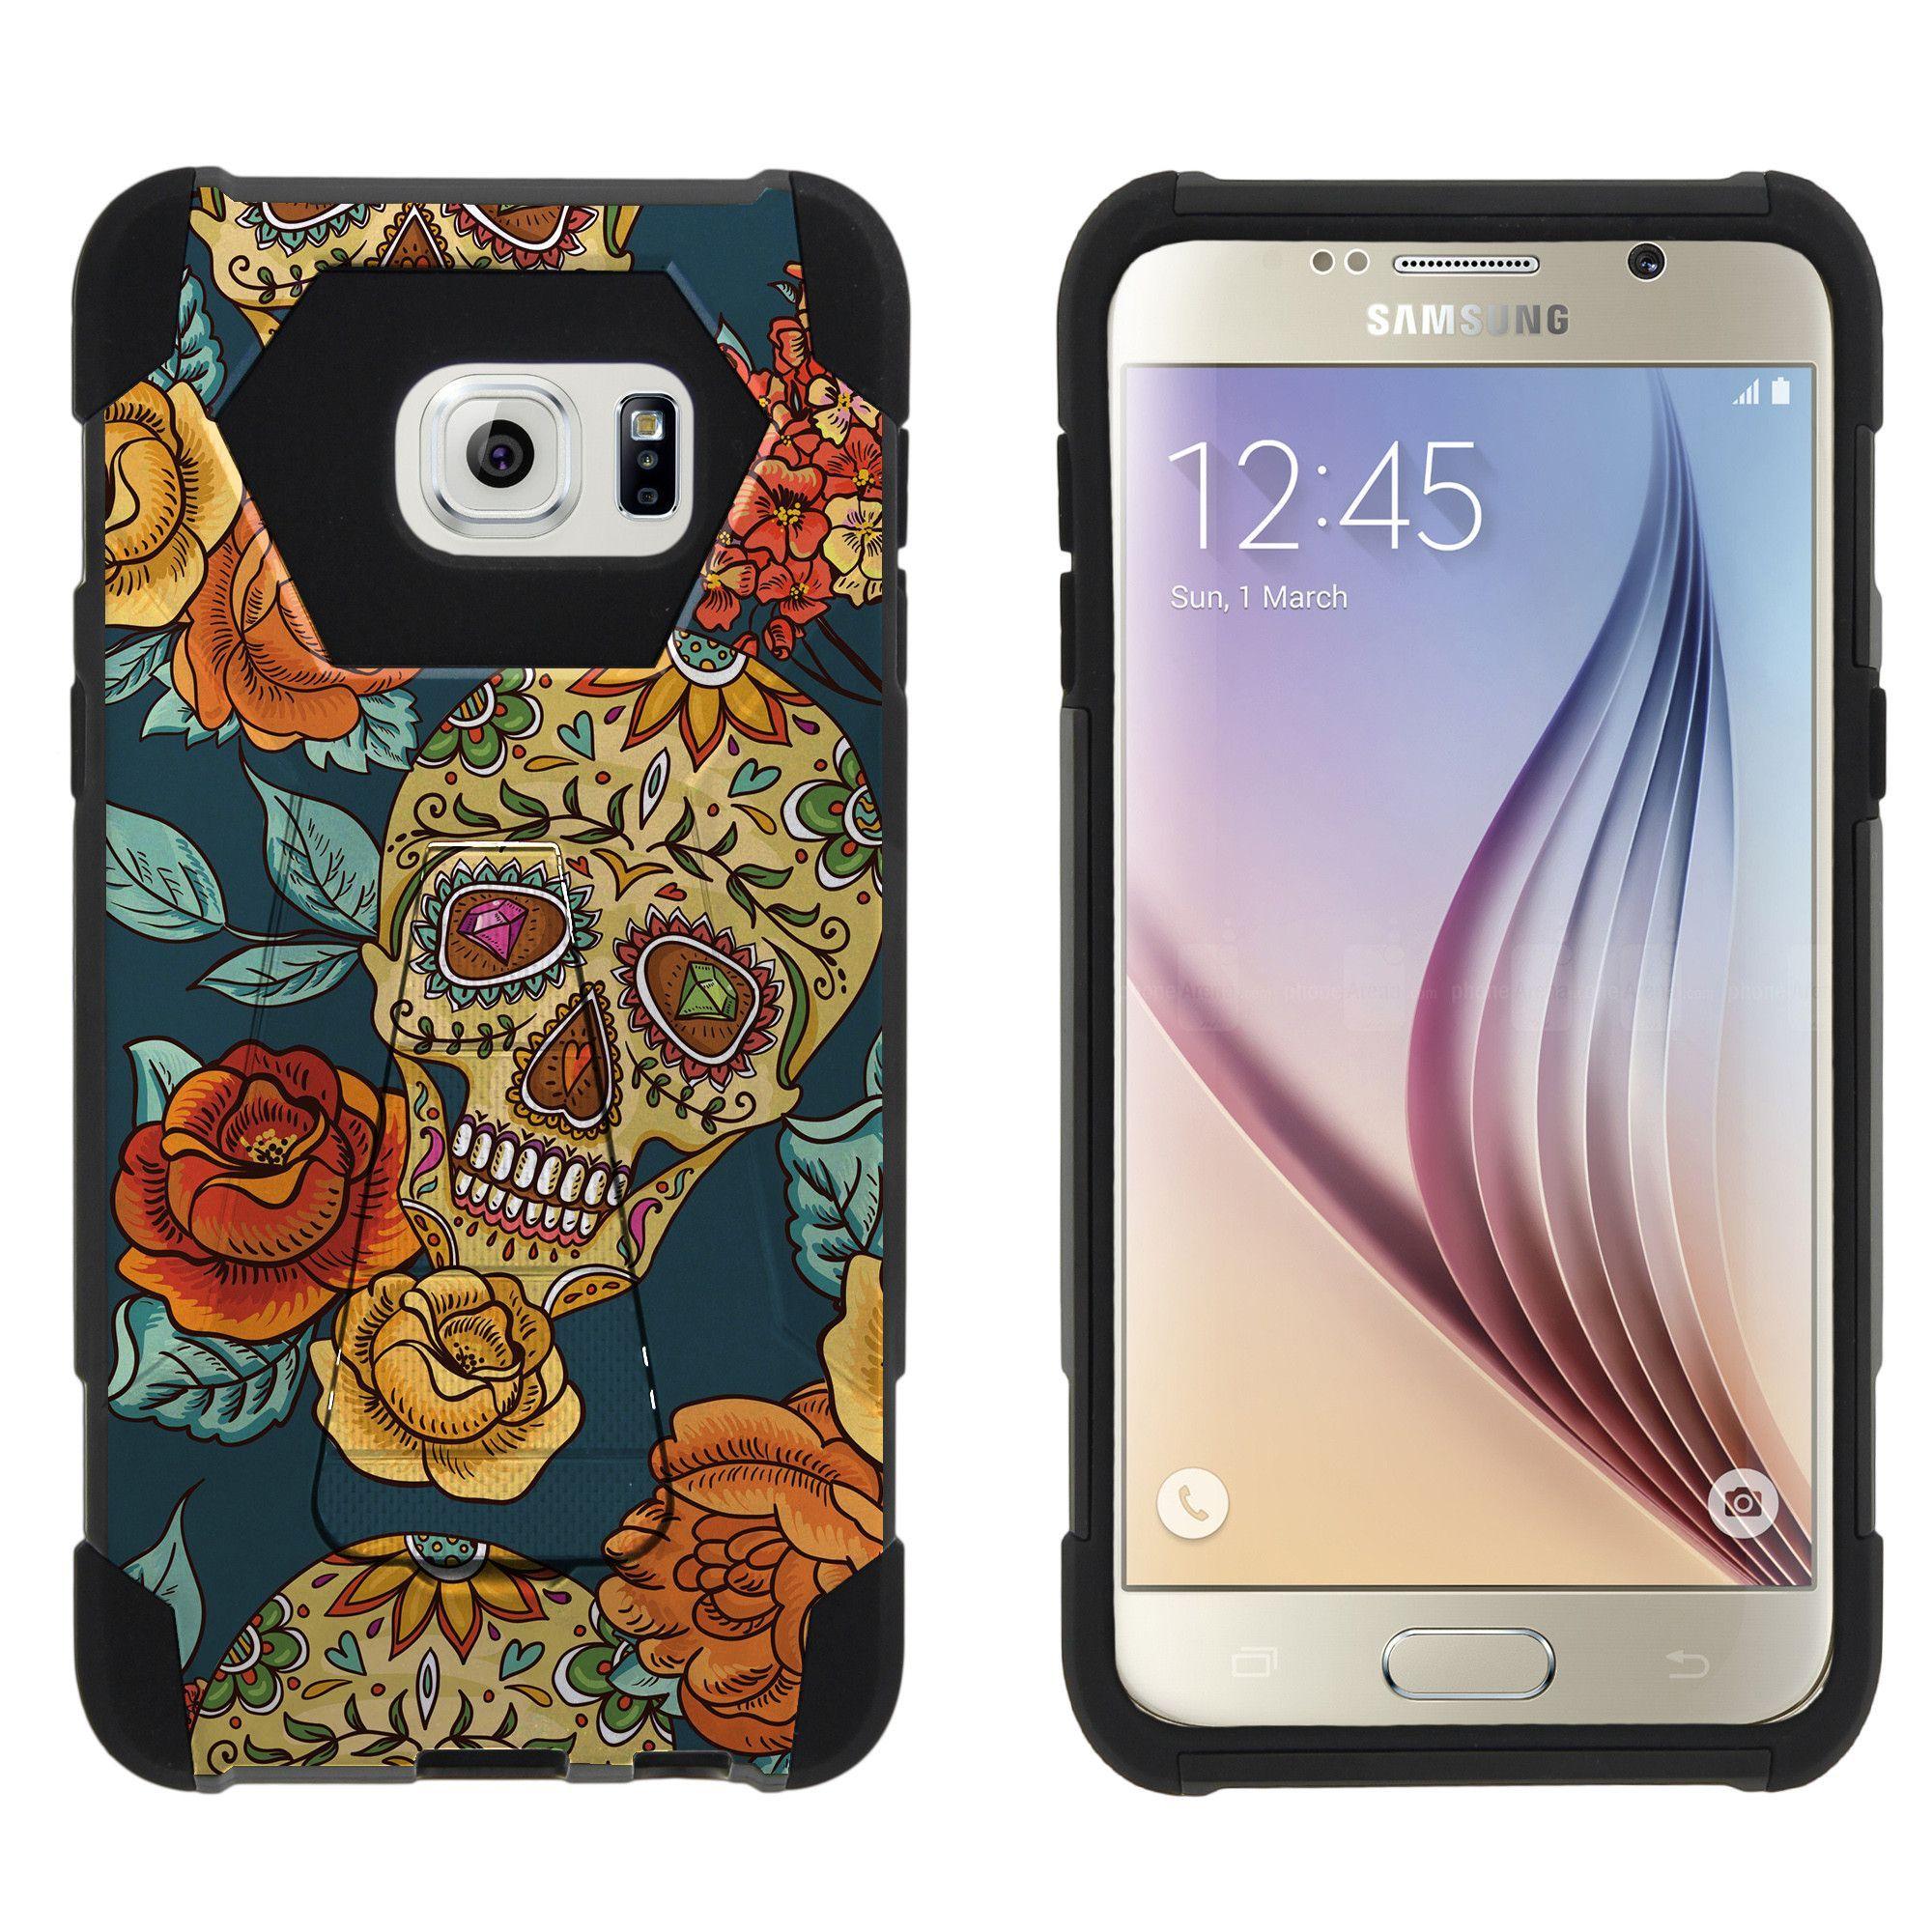 Samsung Galaxy S6 G928 SHOCK FUSION Heavy Duty Kickstand Case - Sugar Skull and Flowers